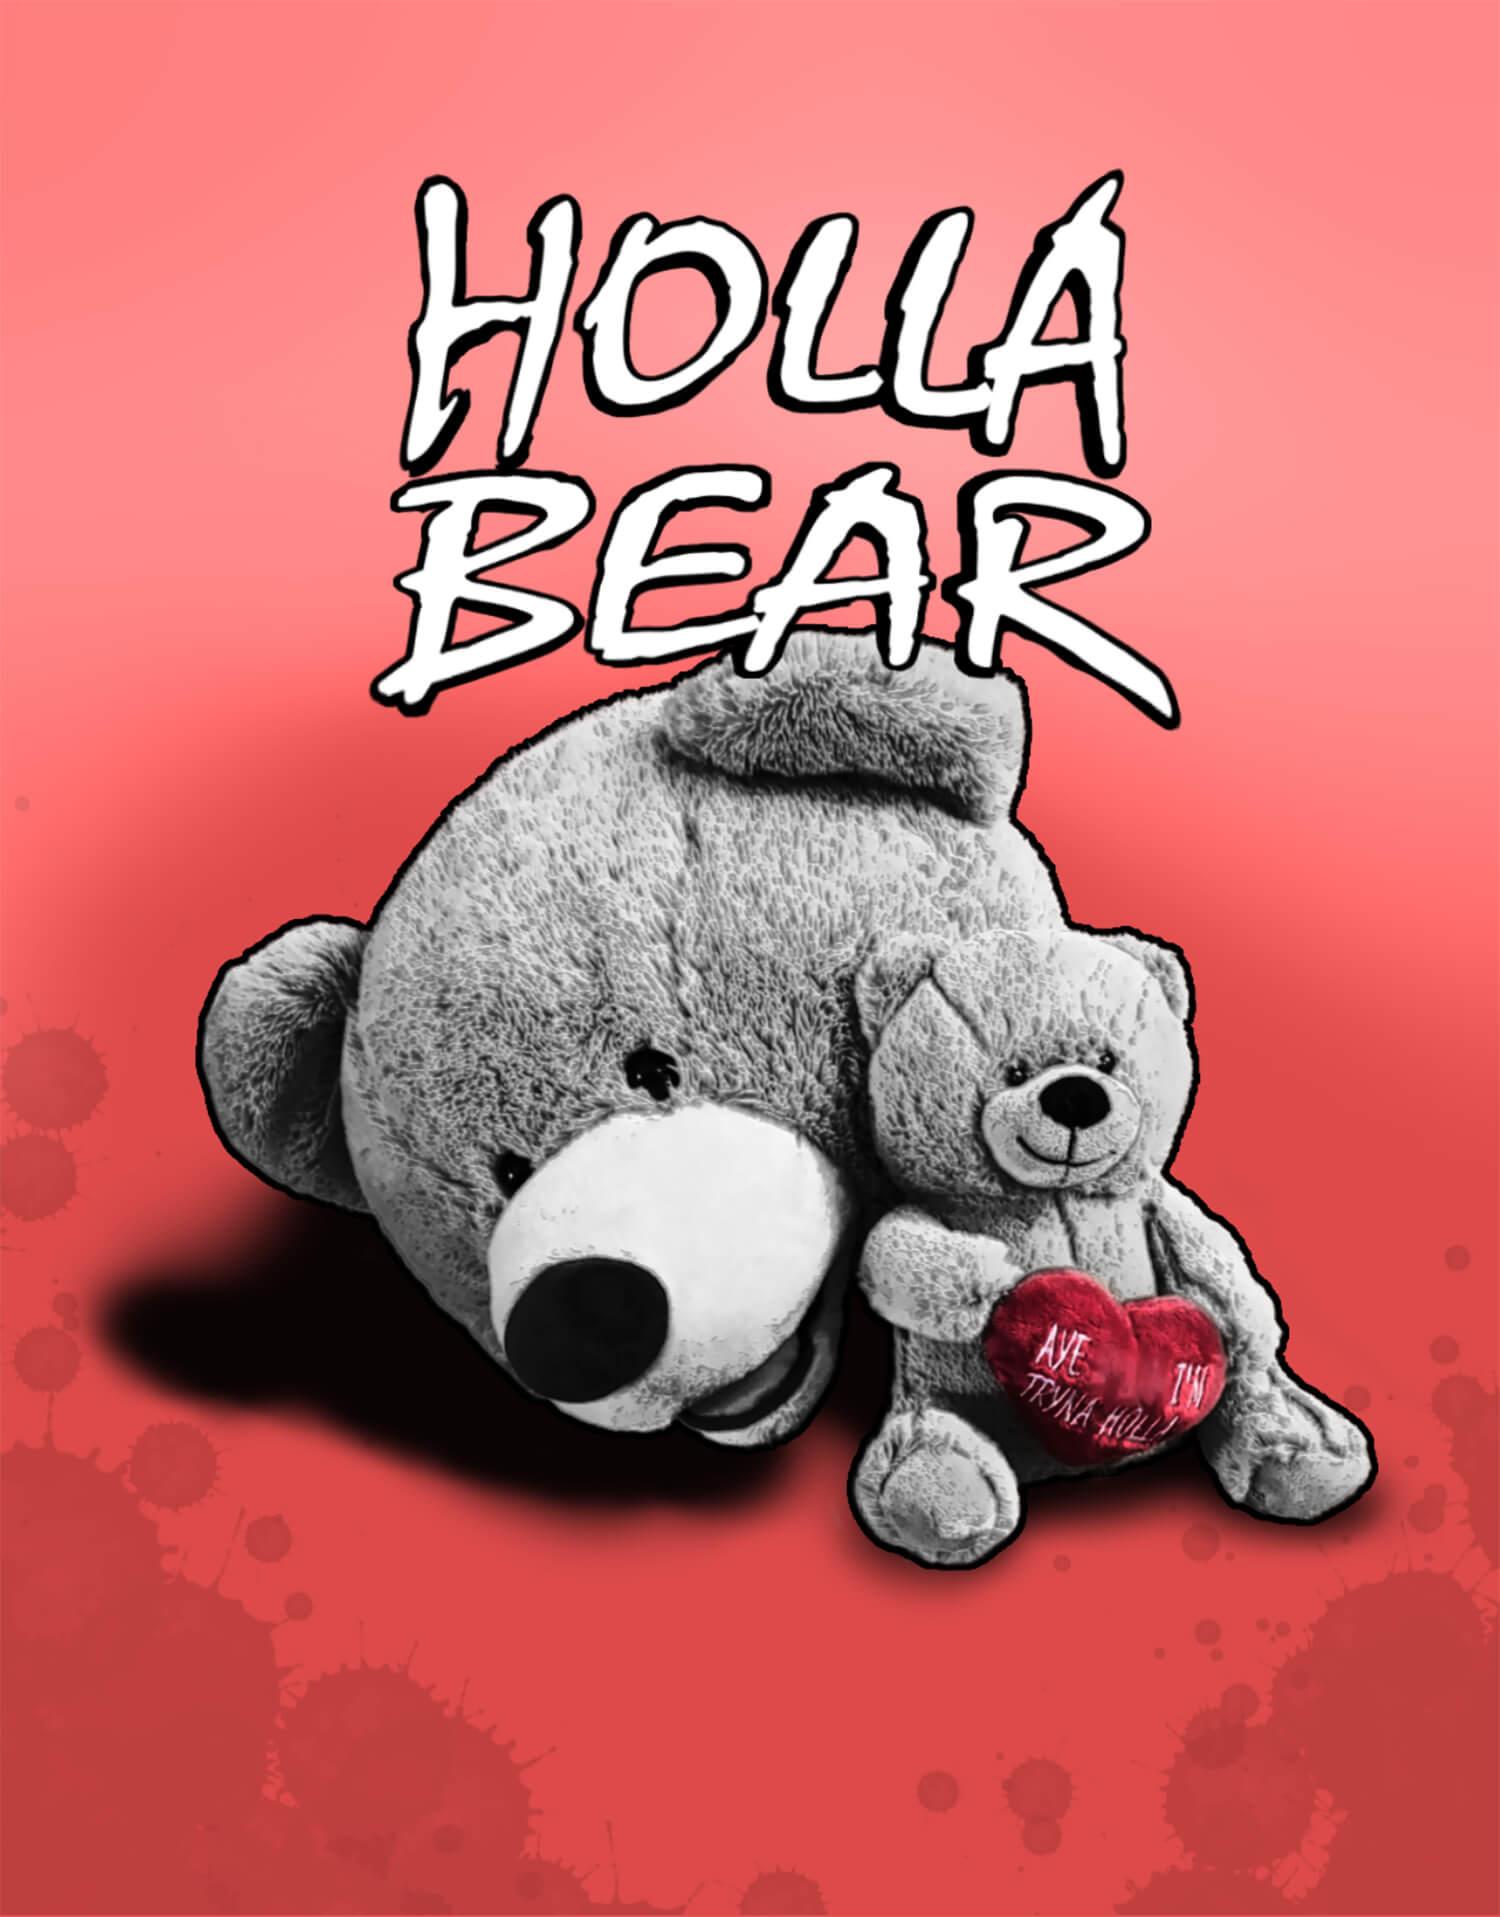 Holla Bear Poster